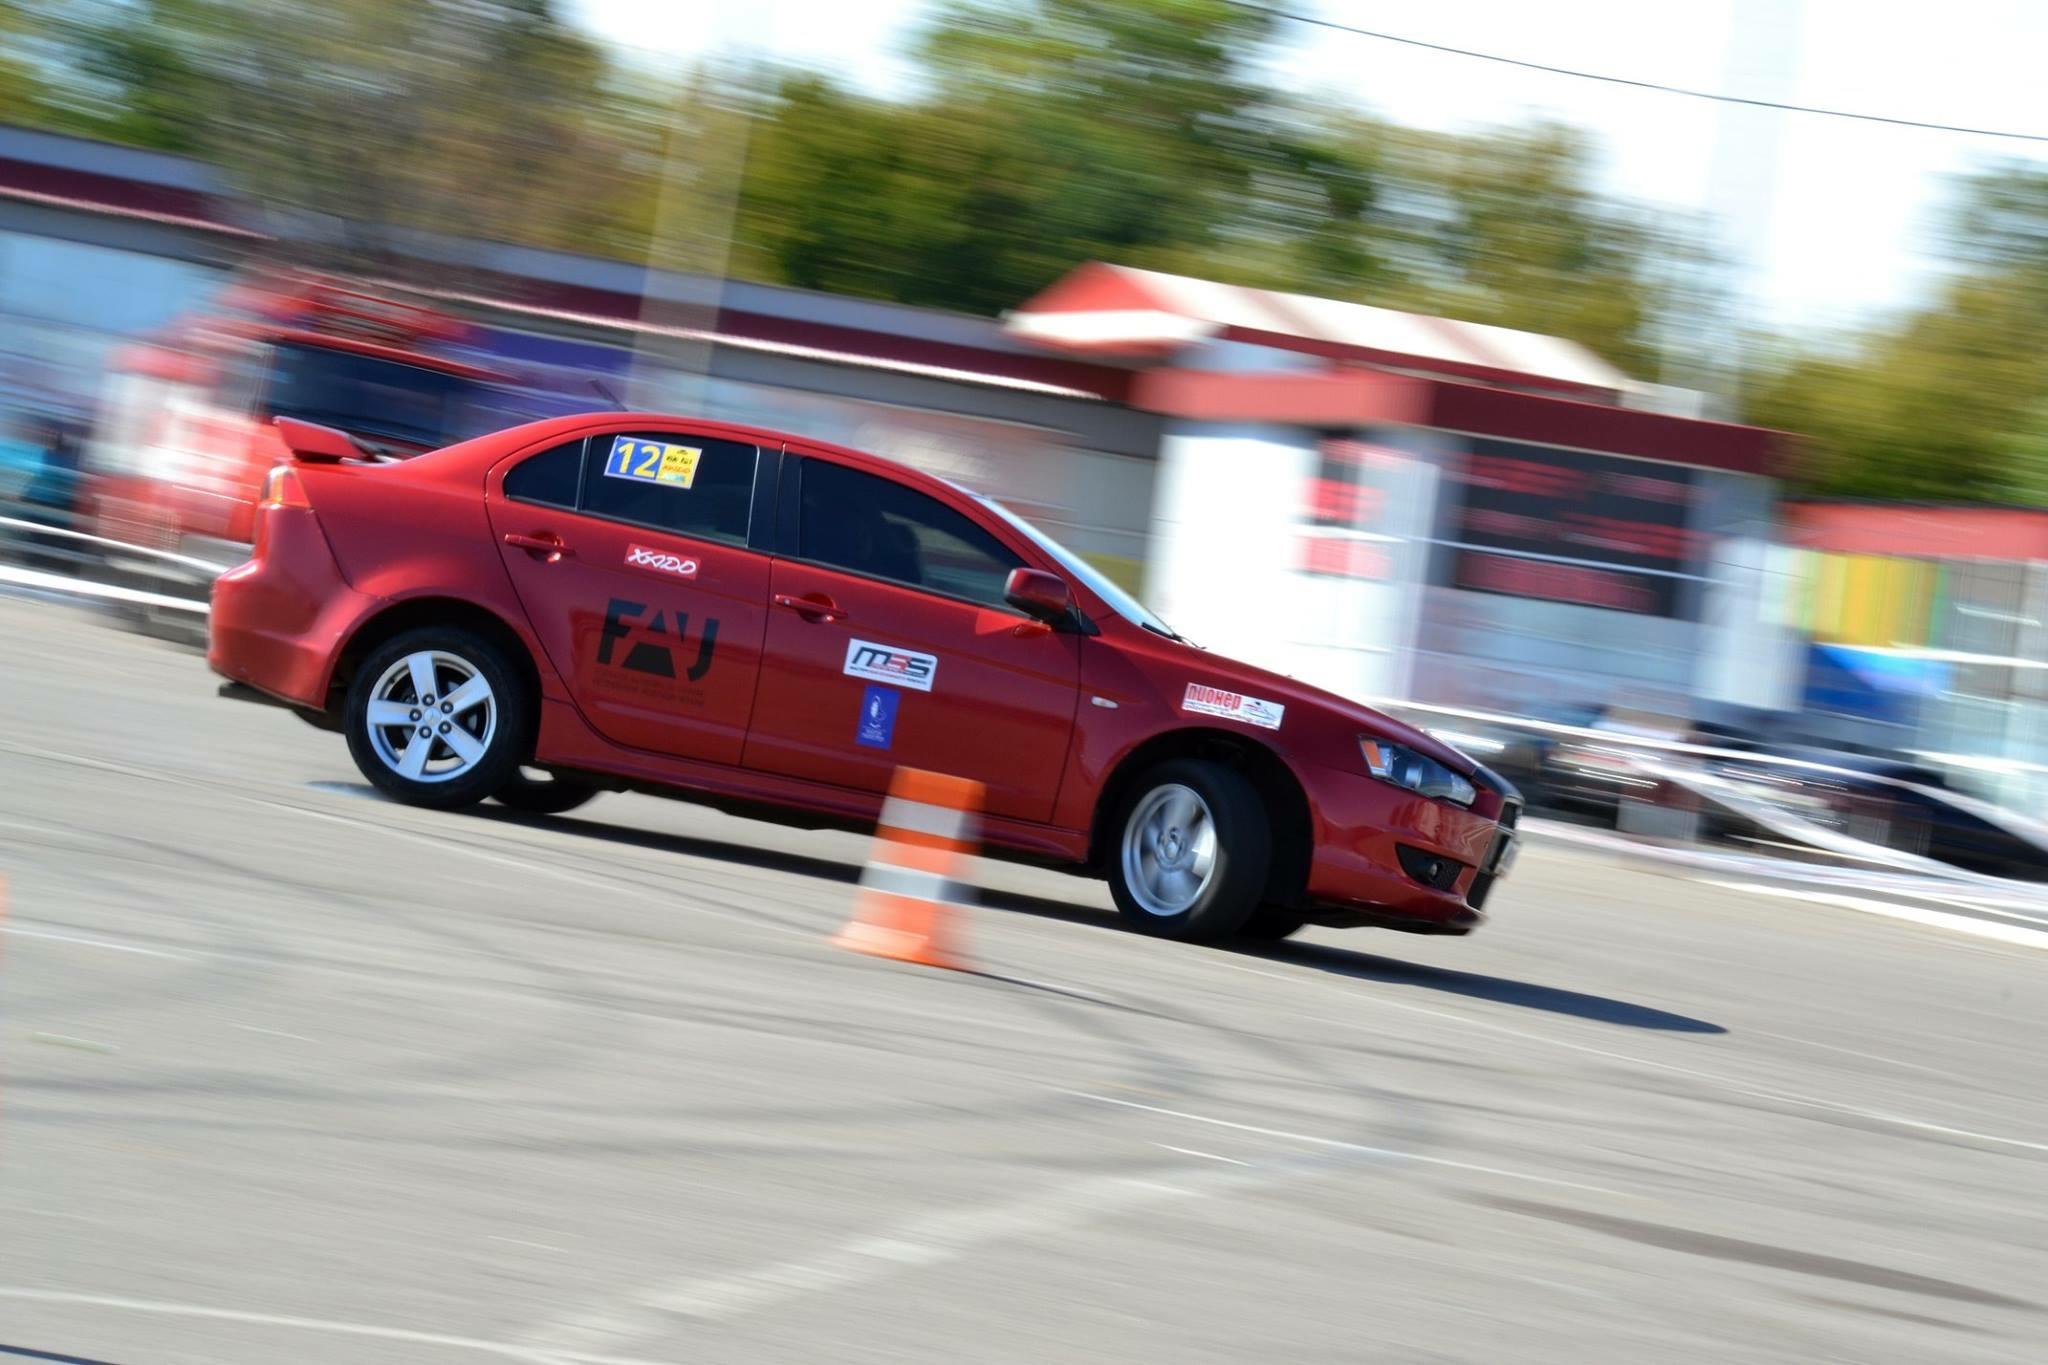 Водитель: Швец Ольга<br/>Штурман: Тесаловский Алексей<br/>Машина: Mitsubishi Lancer (2008г., 2000см³)<br/>Класс: N4